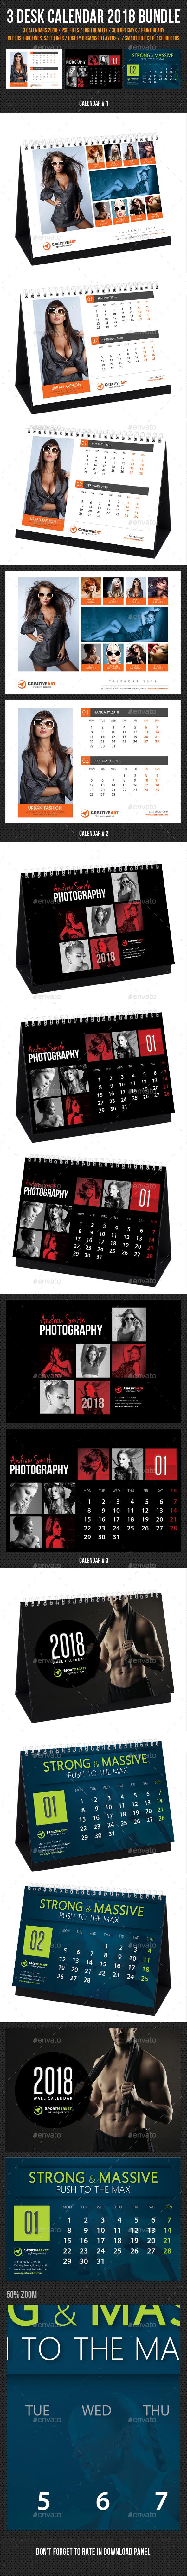 3 in 1 Creative Desk Calendar 2018 Bundle 04 - Calendars Stationery